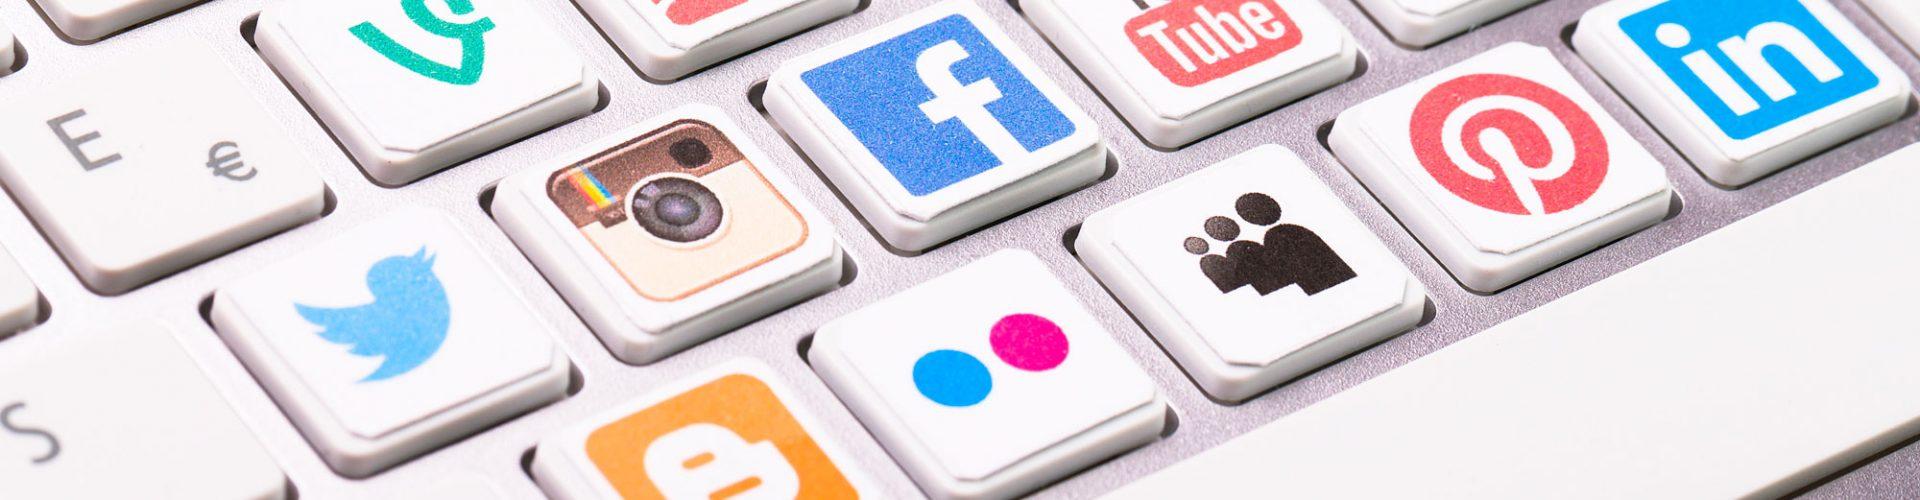 social-media-cand-brandul-devine-prieten